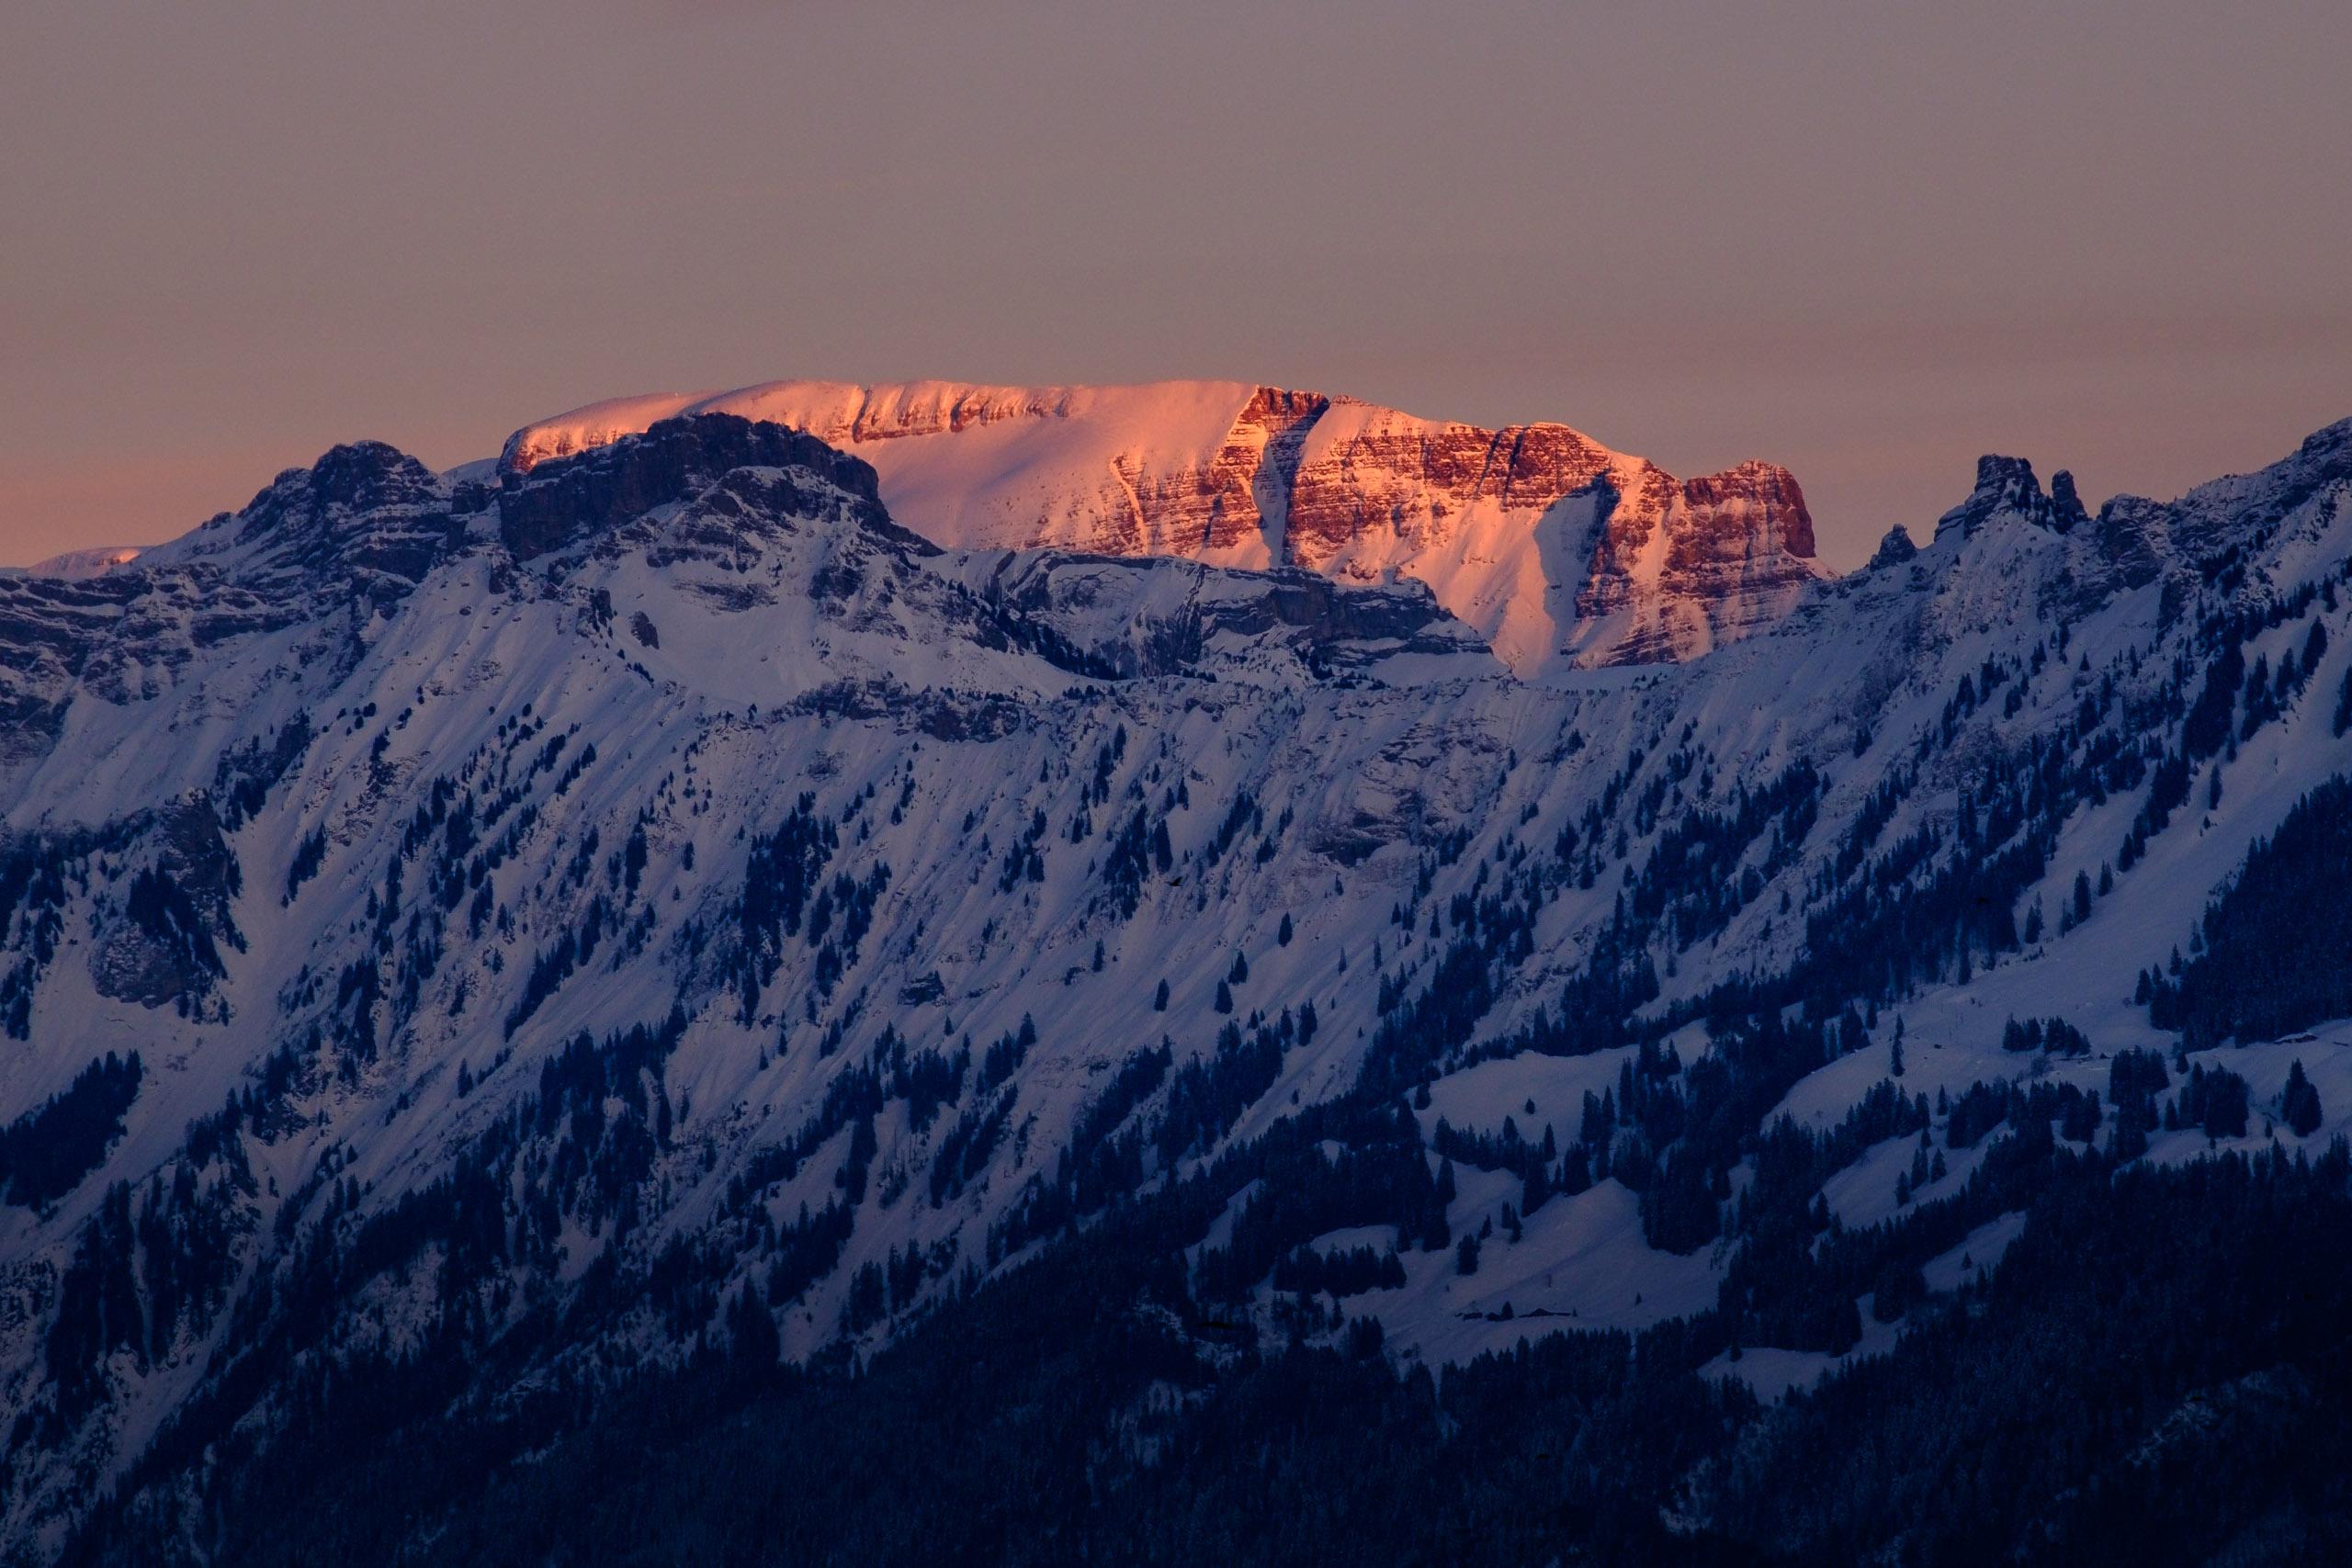 Winteregg (Bussalp), Switzerland